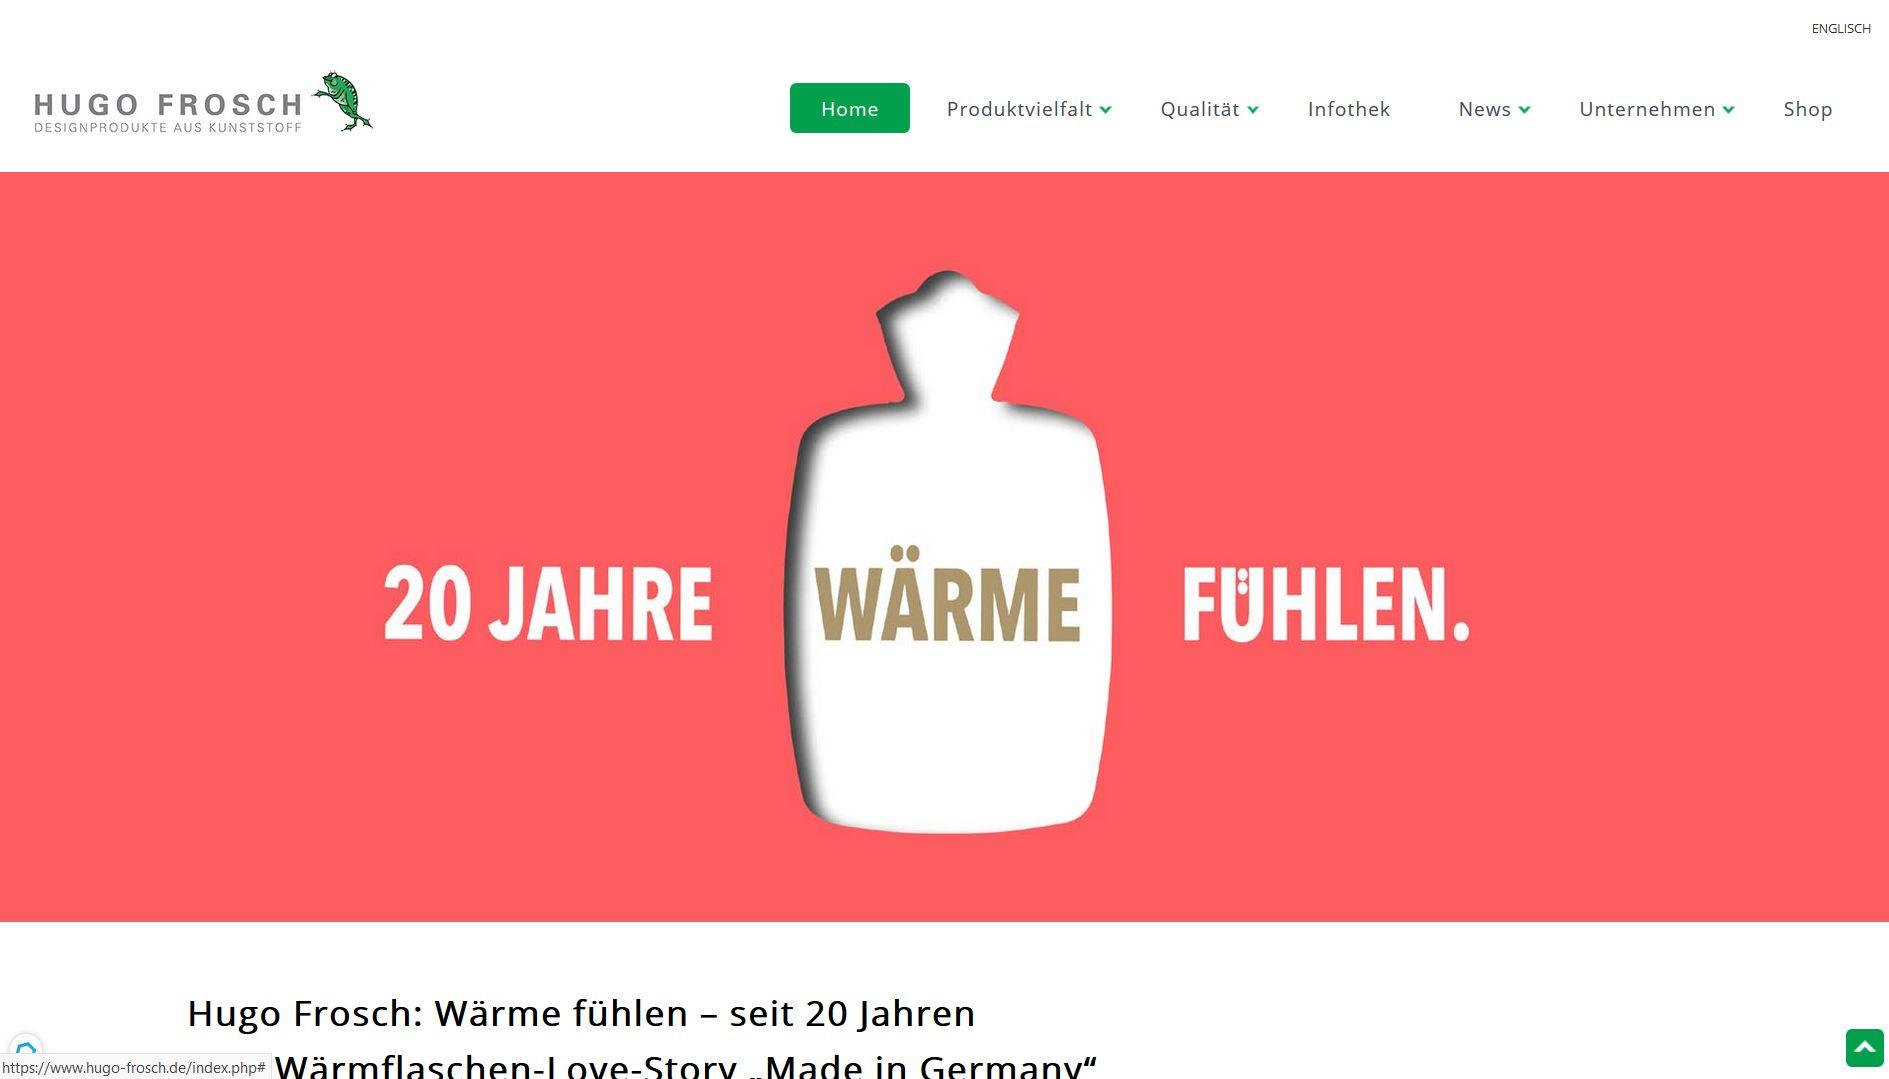 Wärmflaschen Made in Germany